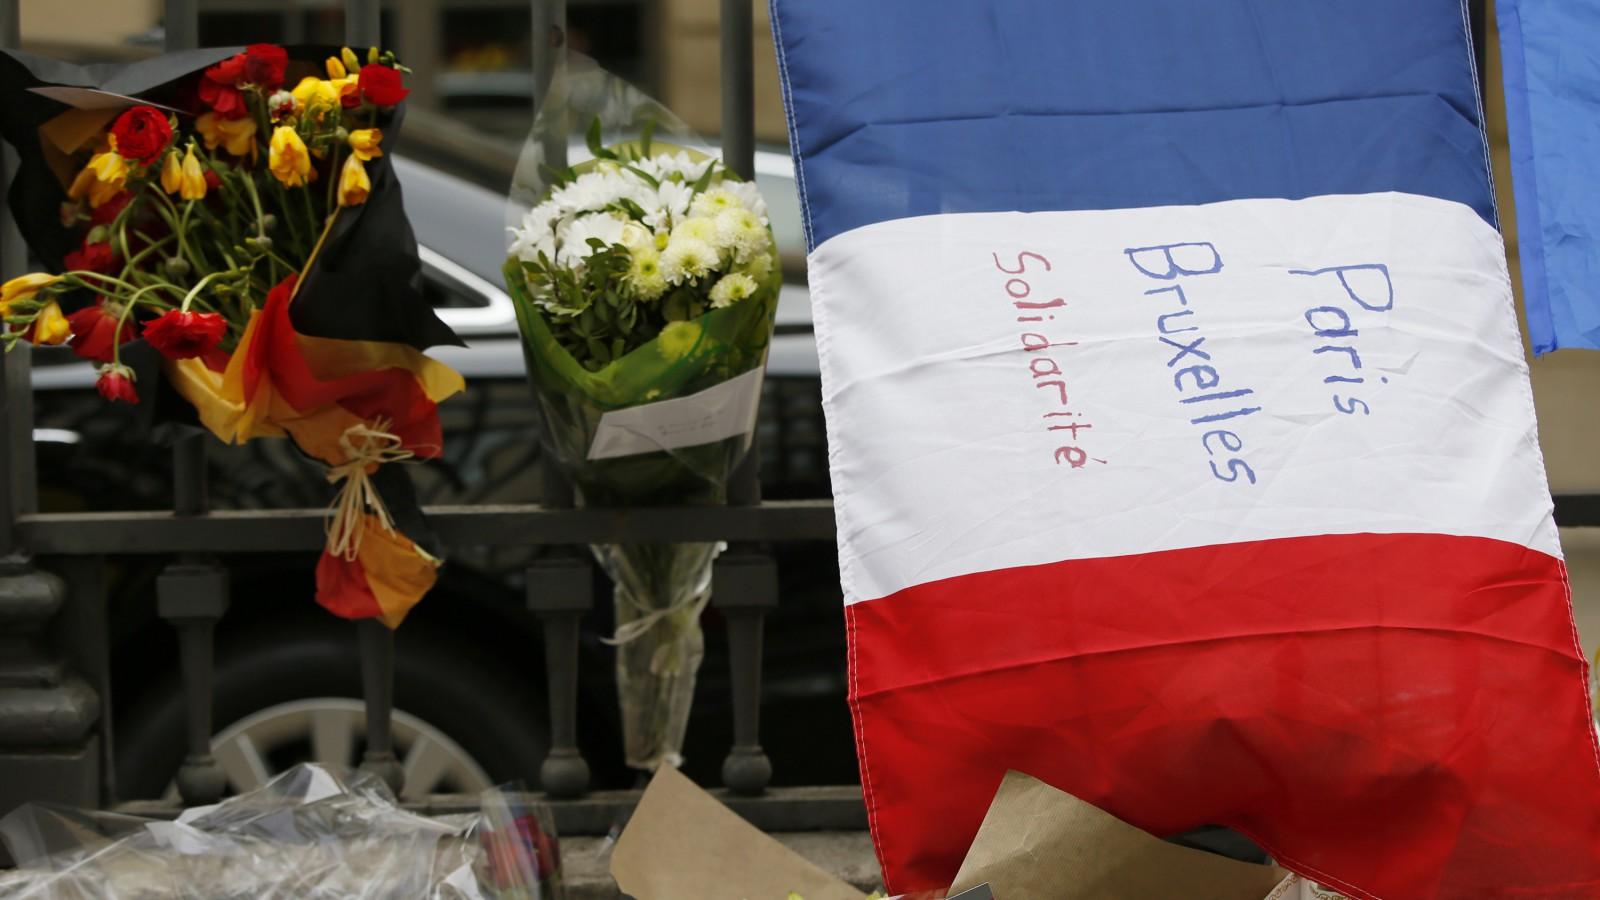 Paris. Brussels. Solidarity.